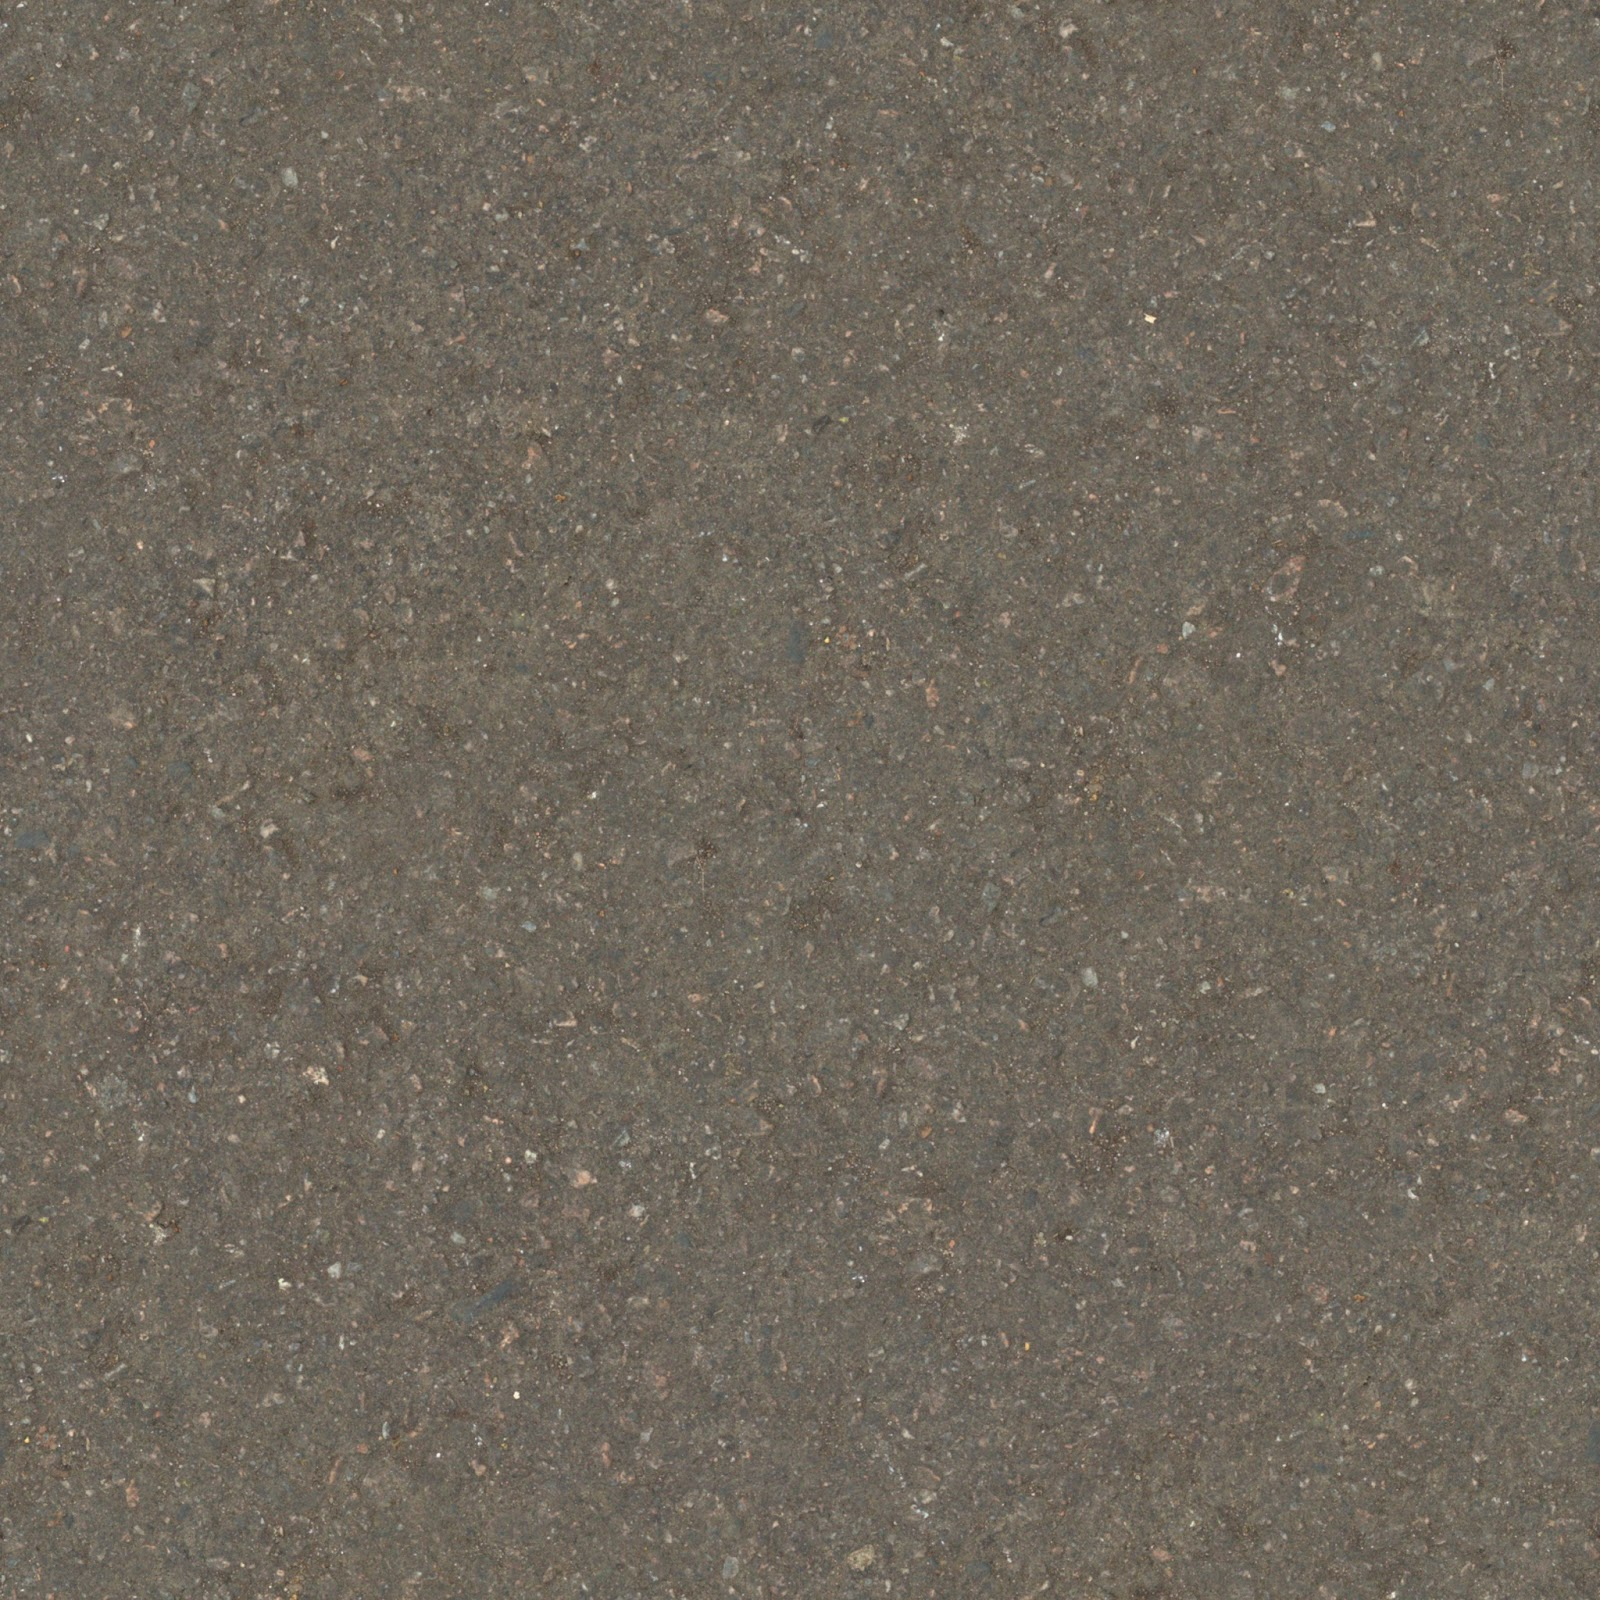 Flooring For Dirt Floor: High Resolution Seamless Textures: Dirt Ground Floor Feb